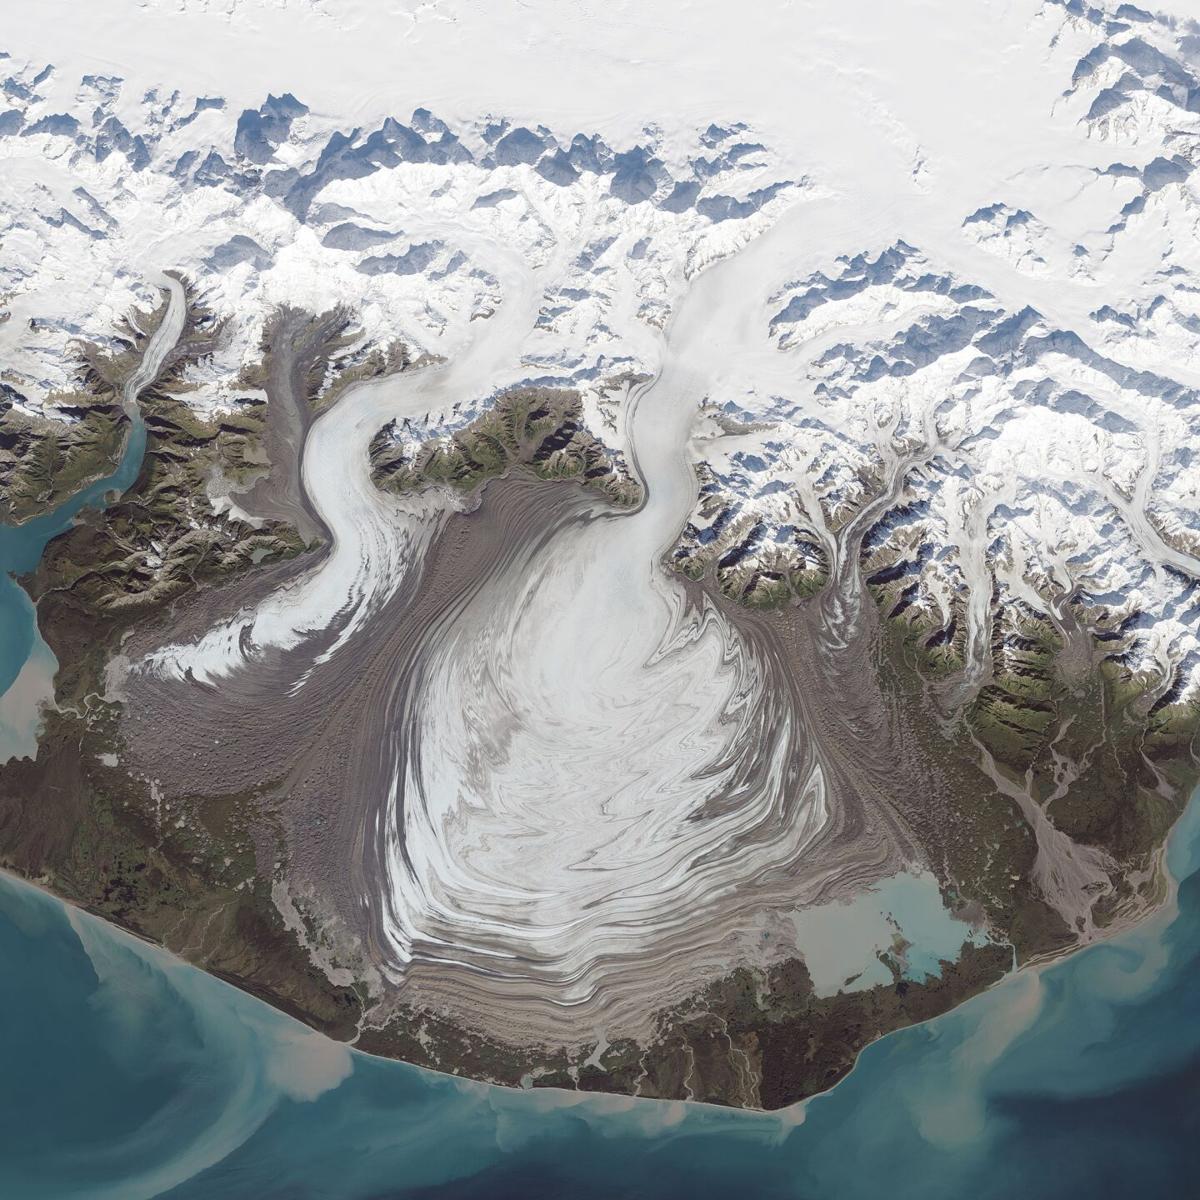 2. Malaspina Glacier by NASA Goddard Space Flight Center.jpg